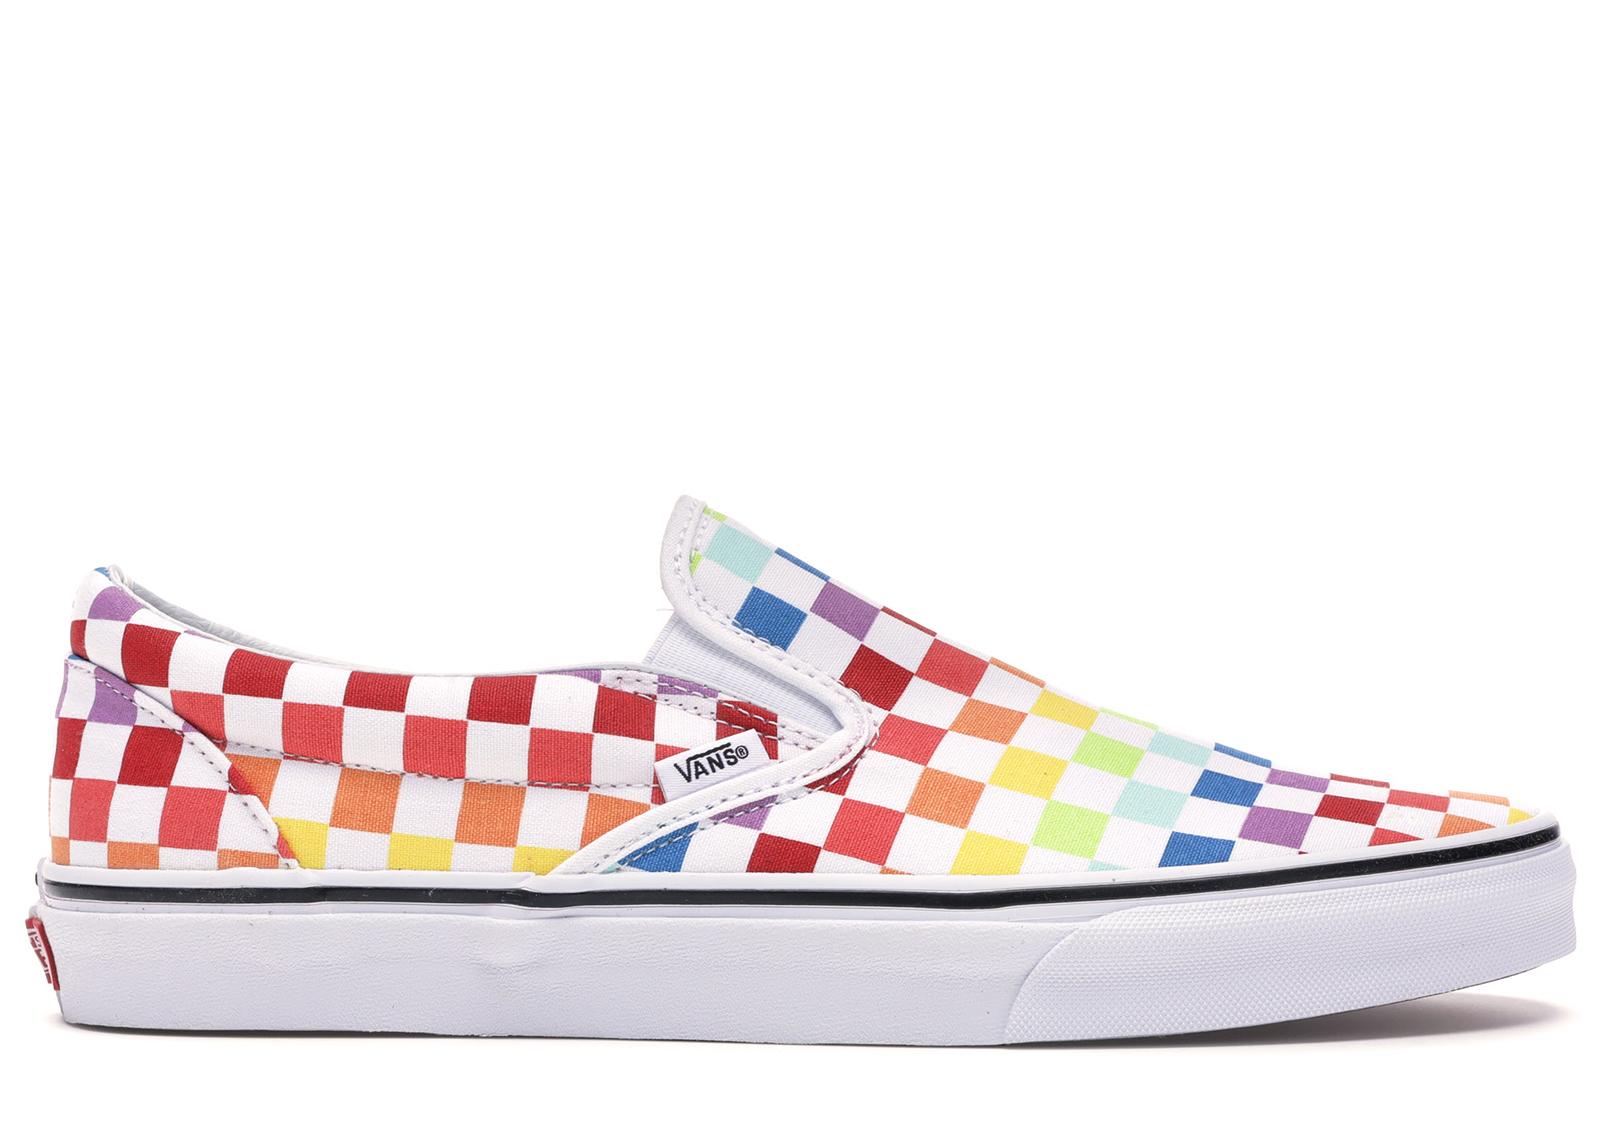 Vans Slip-On Rainbow Checkerboard